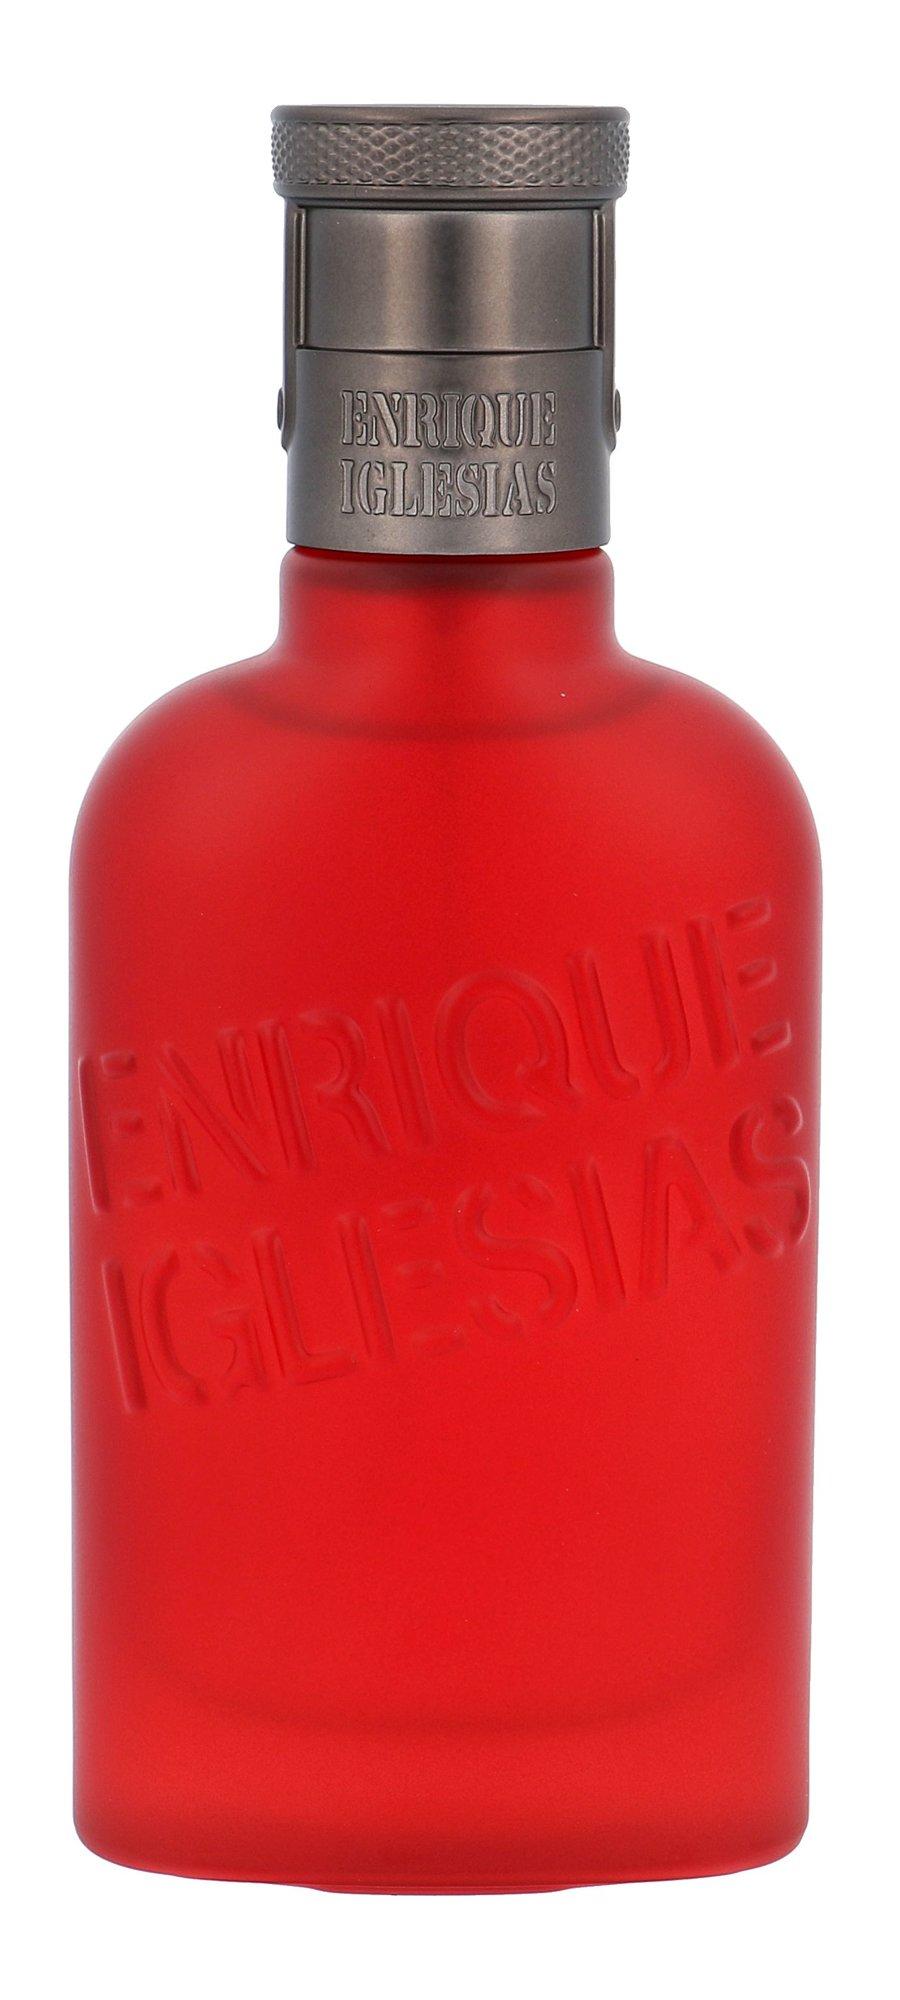 Enrique Iglesias Adrenaline EDT 50ml